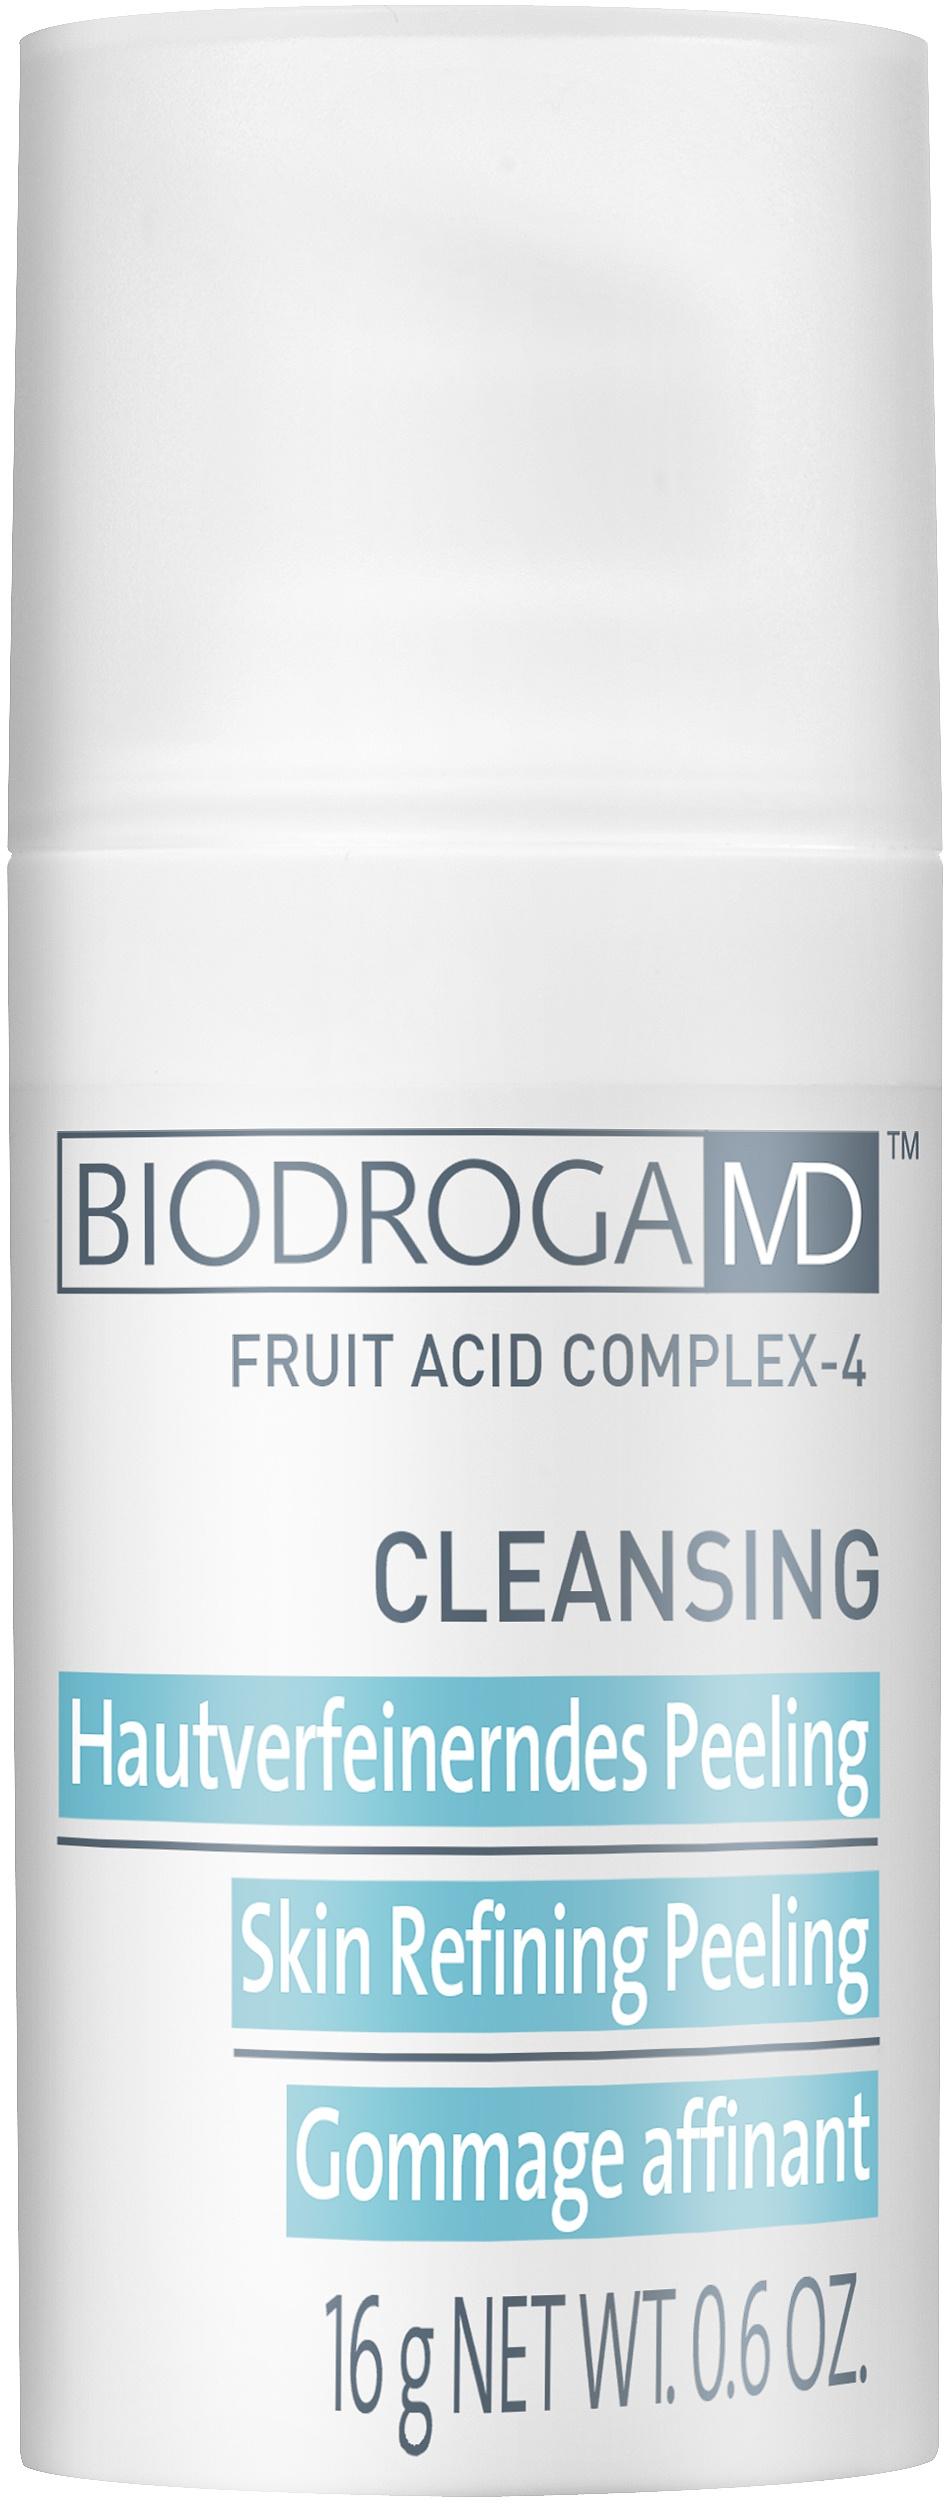 Biodroga MD Cleansing Skin Refining Peeling